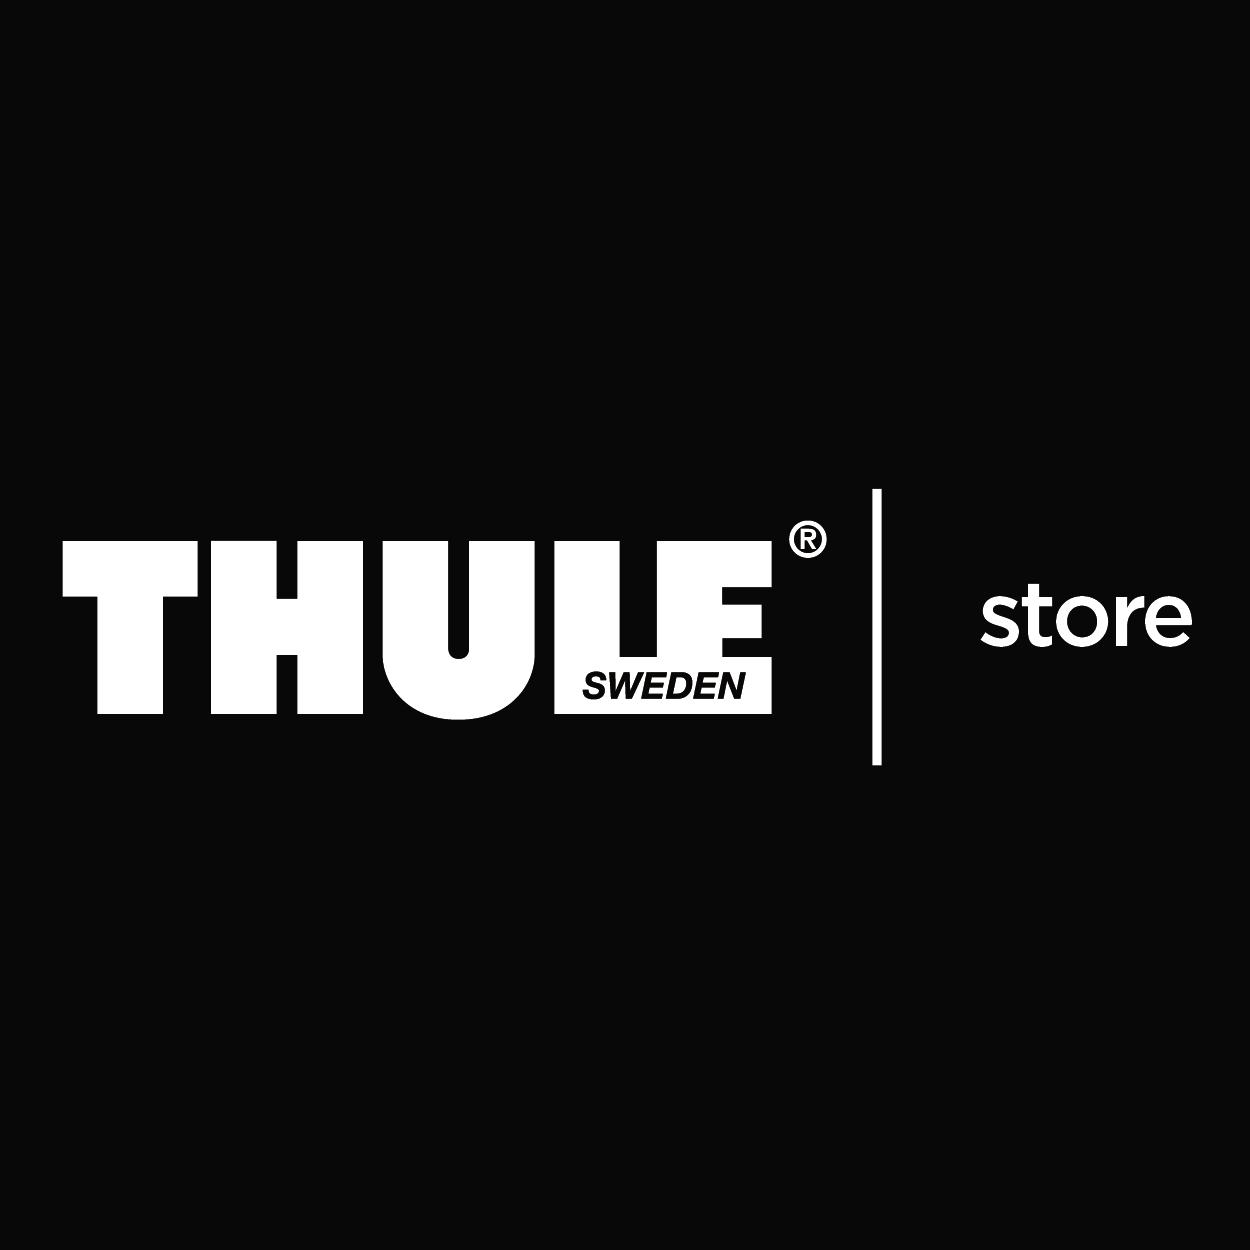 Thule Store